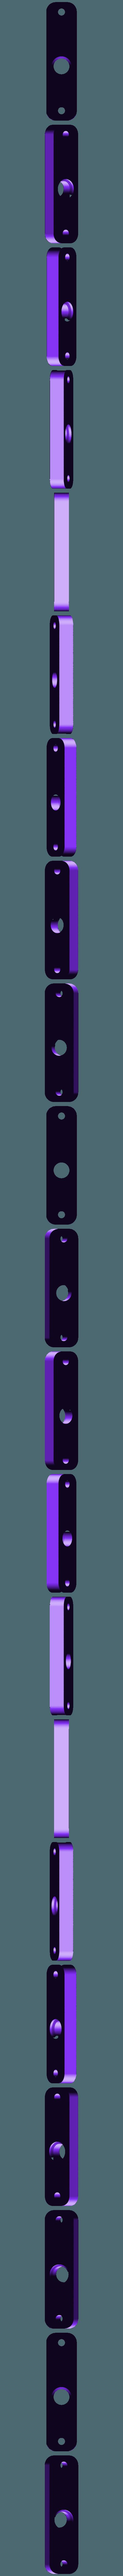 Geared_Extrude_geared_extruder_teflon_clip_holder_part1.stl Download free STL file FDM Printer de Kleine Reus 300x300x900 • 3D printable object, Job